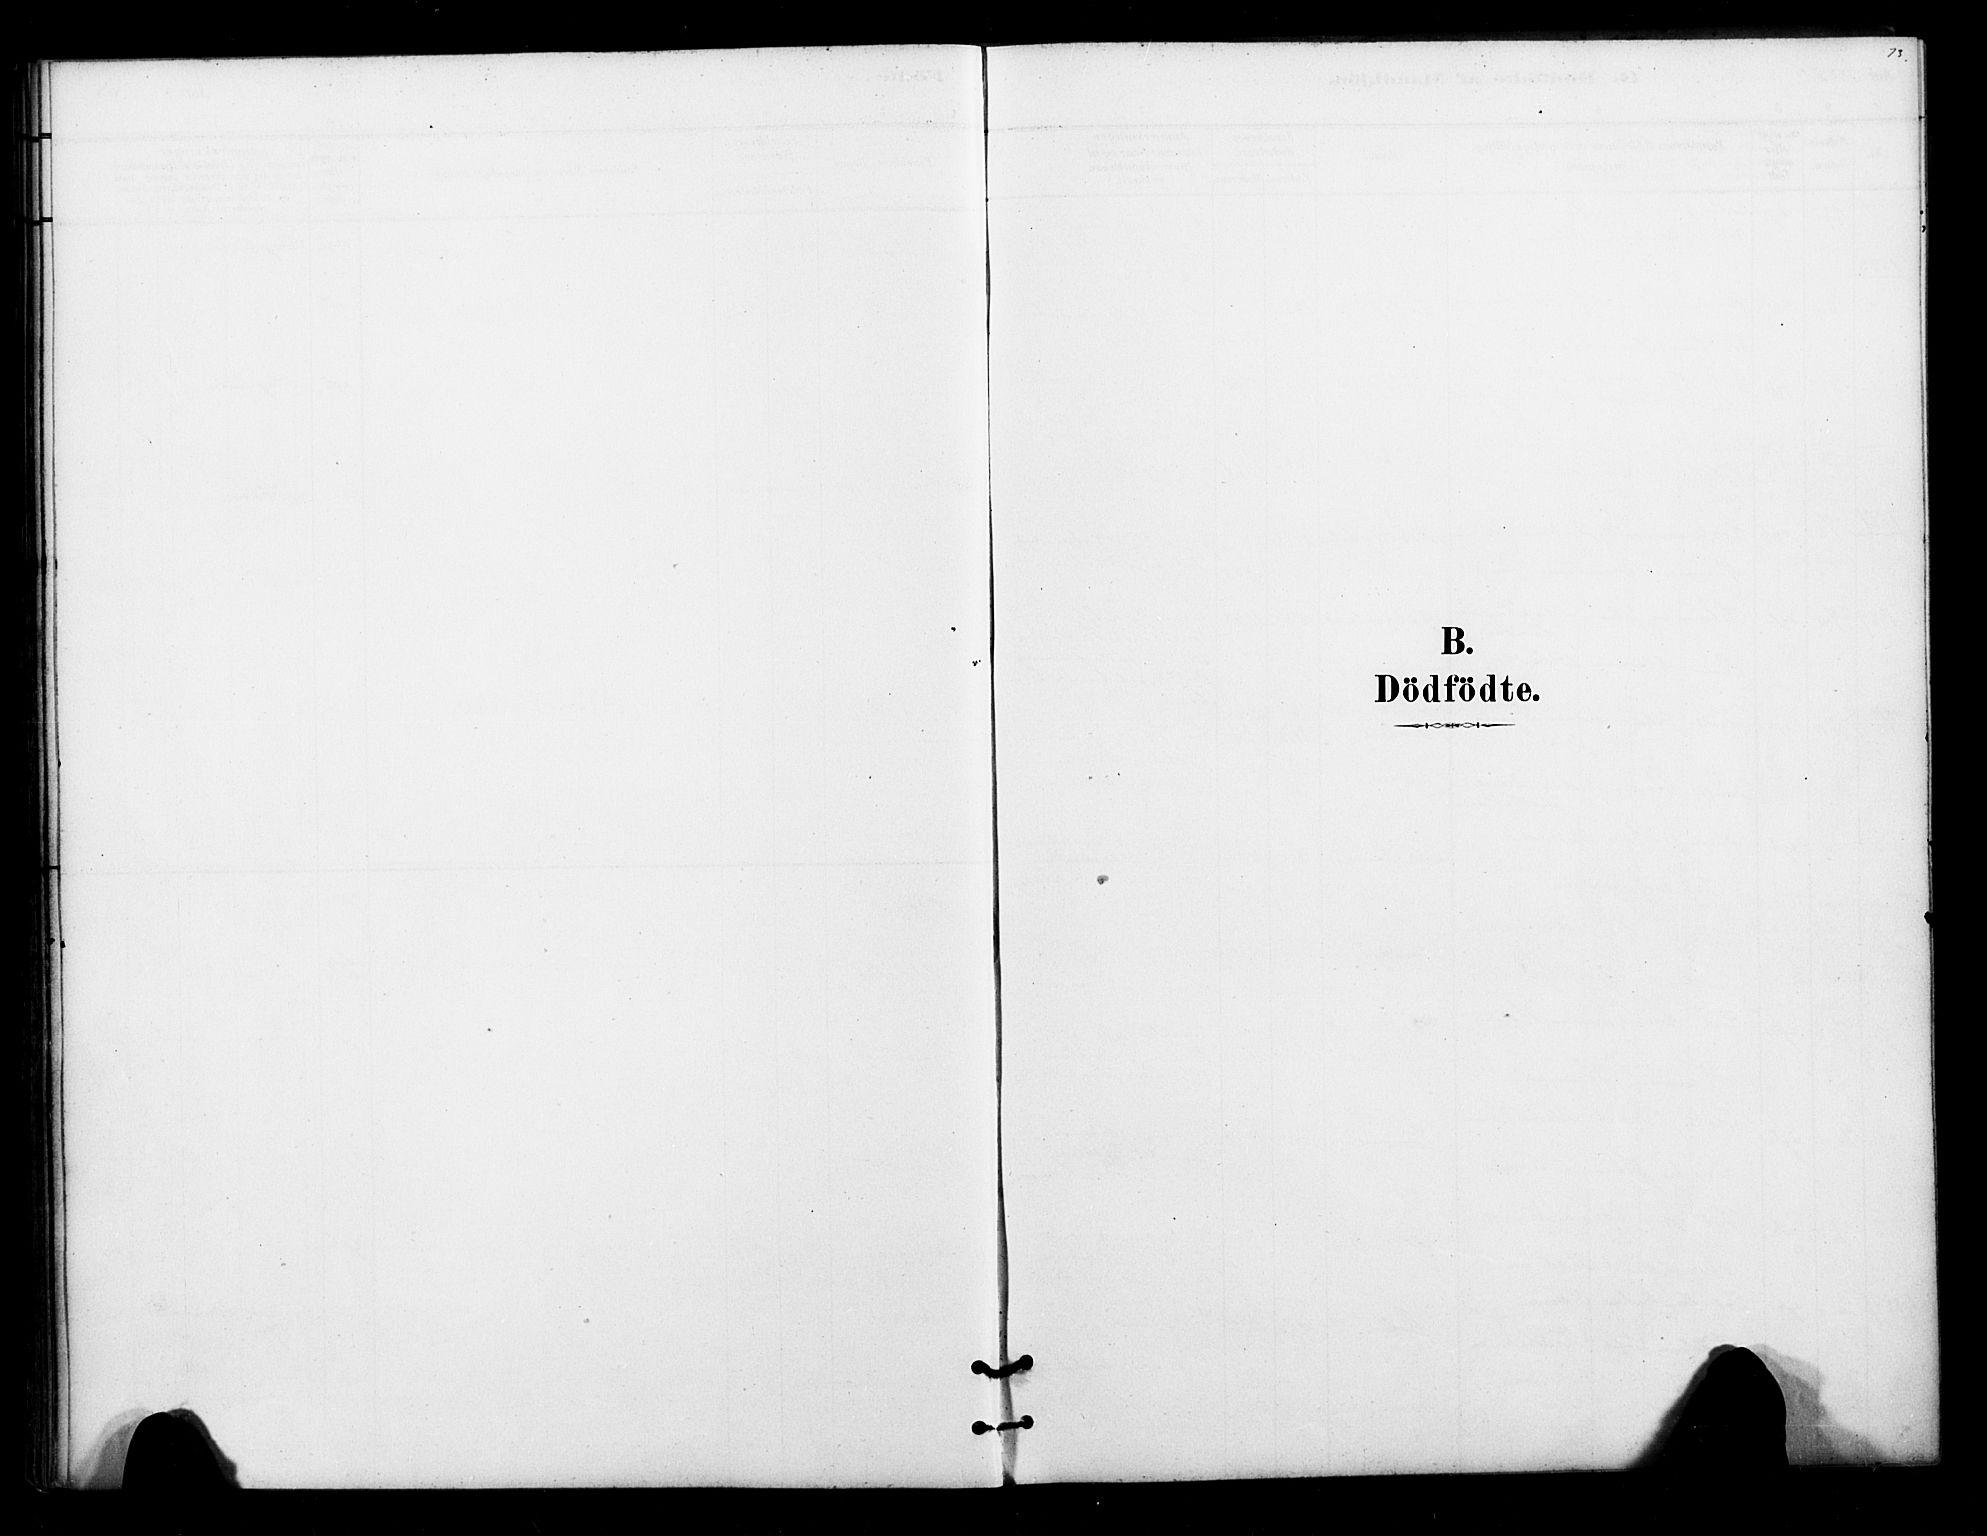 SATØ, Lenvik sokneprestembete, H/Ha: Ministerialbok nr. 12, 1880-1895, s. 73